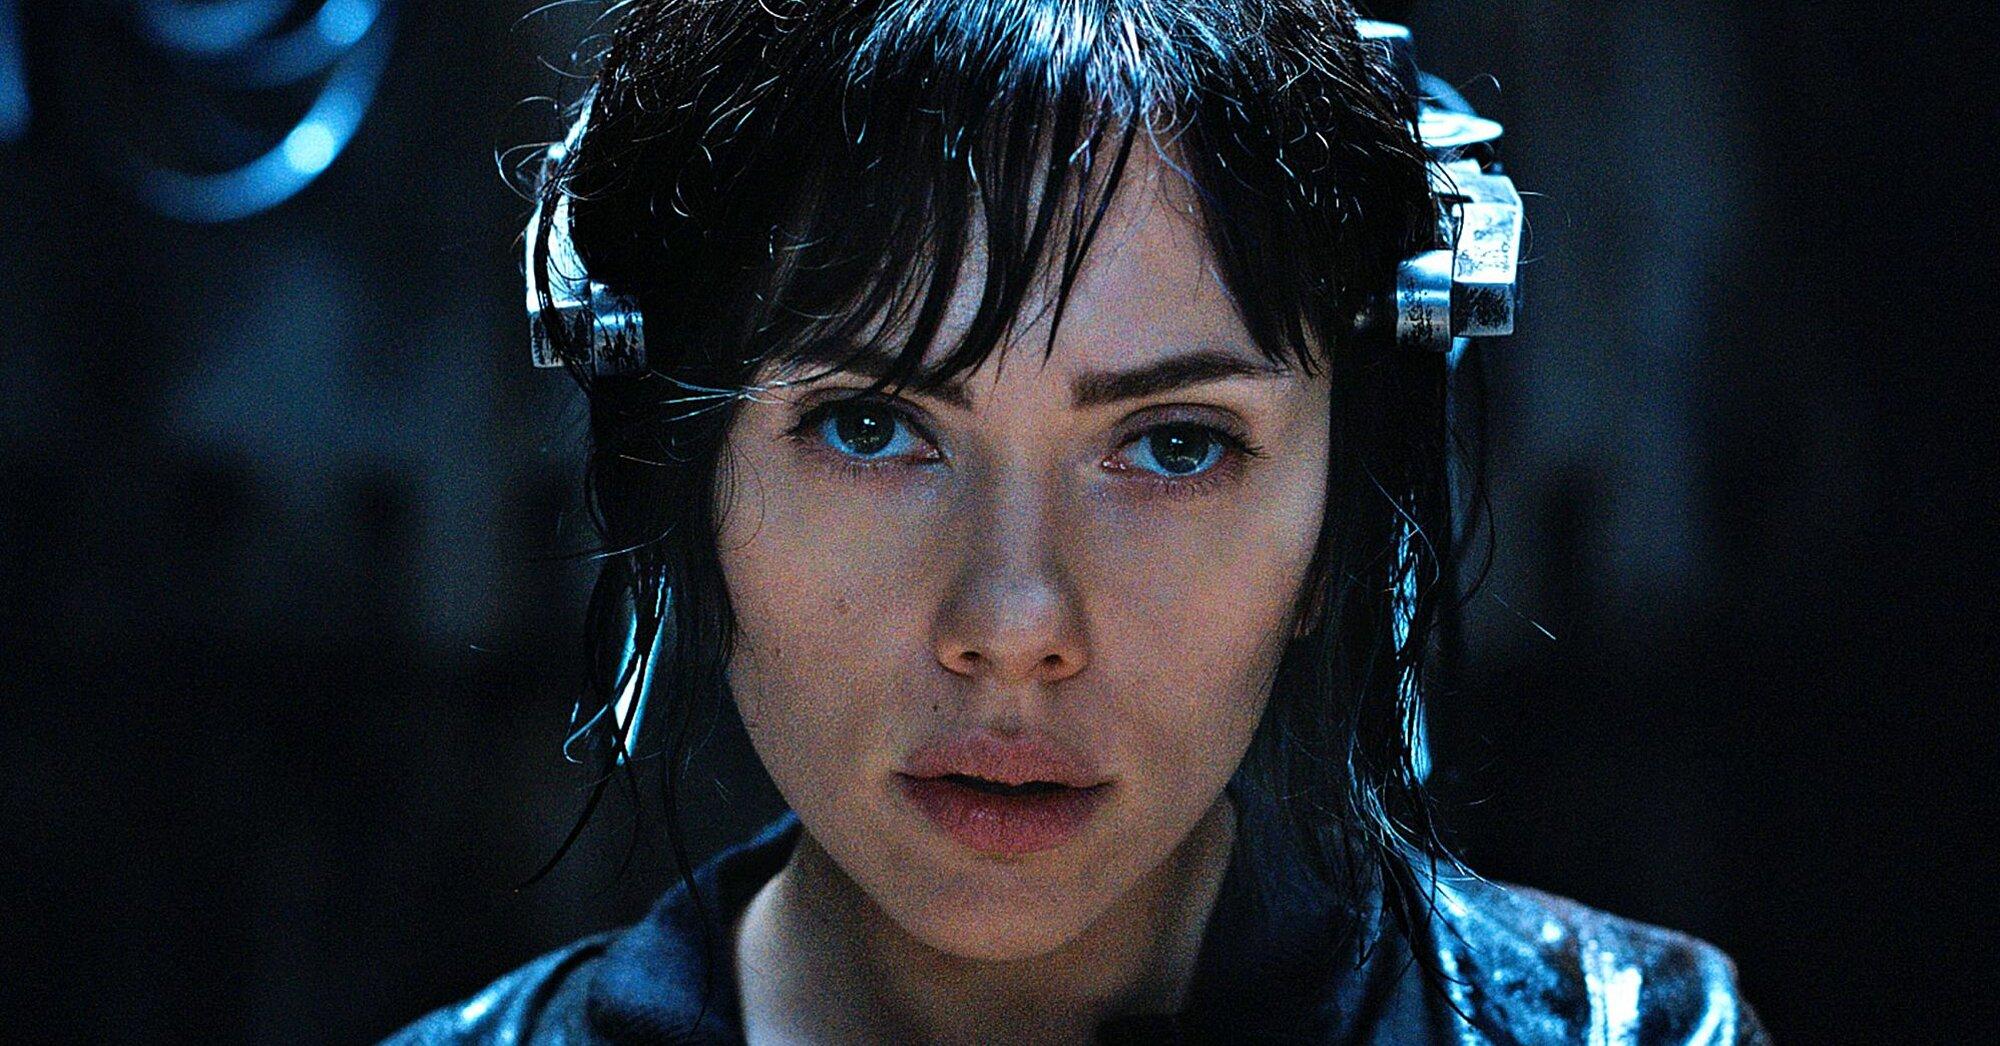 Ghost In The Shell Scarlett Johansson Talks Whitewashing Ew Com